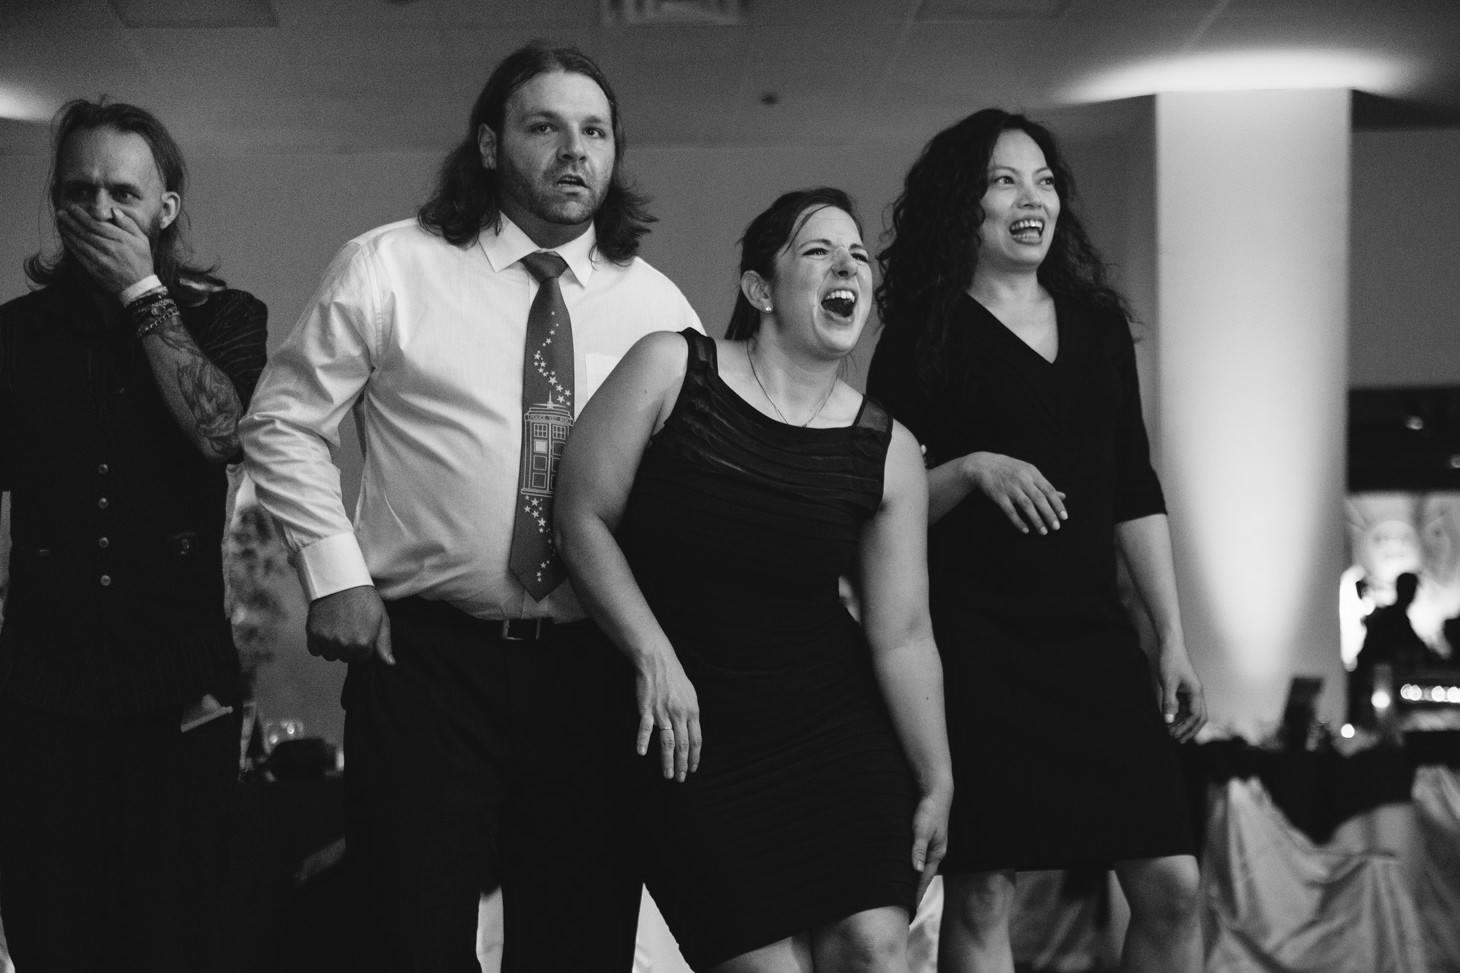 051-nyc-wedding-photographer-nj-nerdy-dr-who-firehouse-wedding-smitten-chickens.jpg